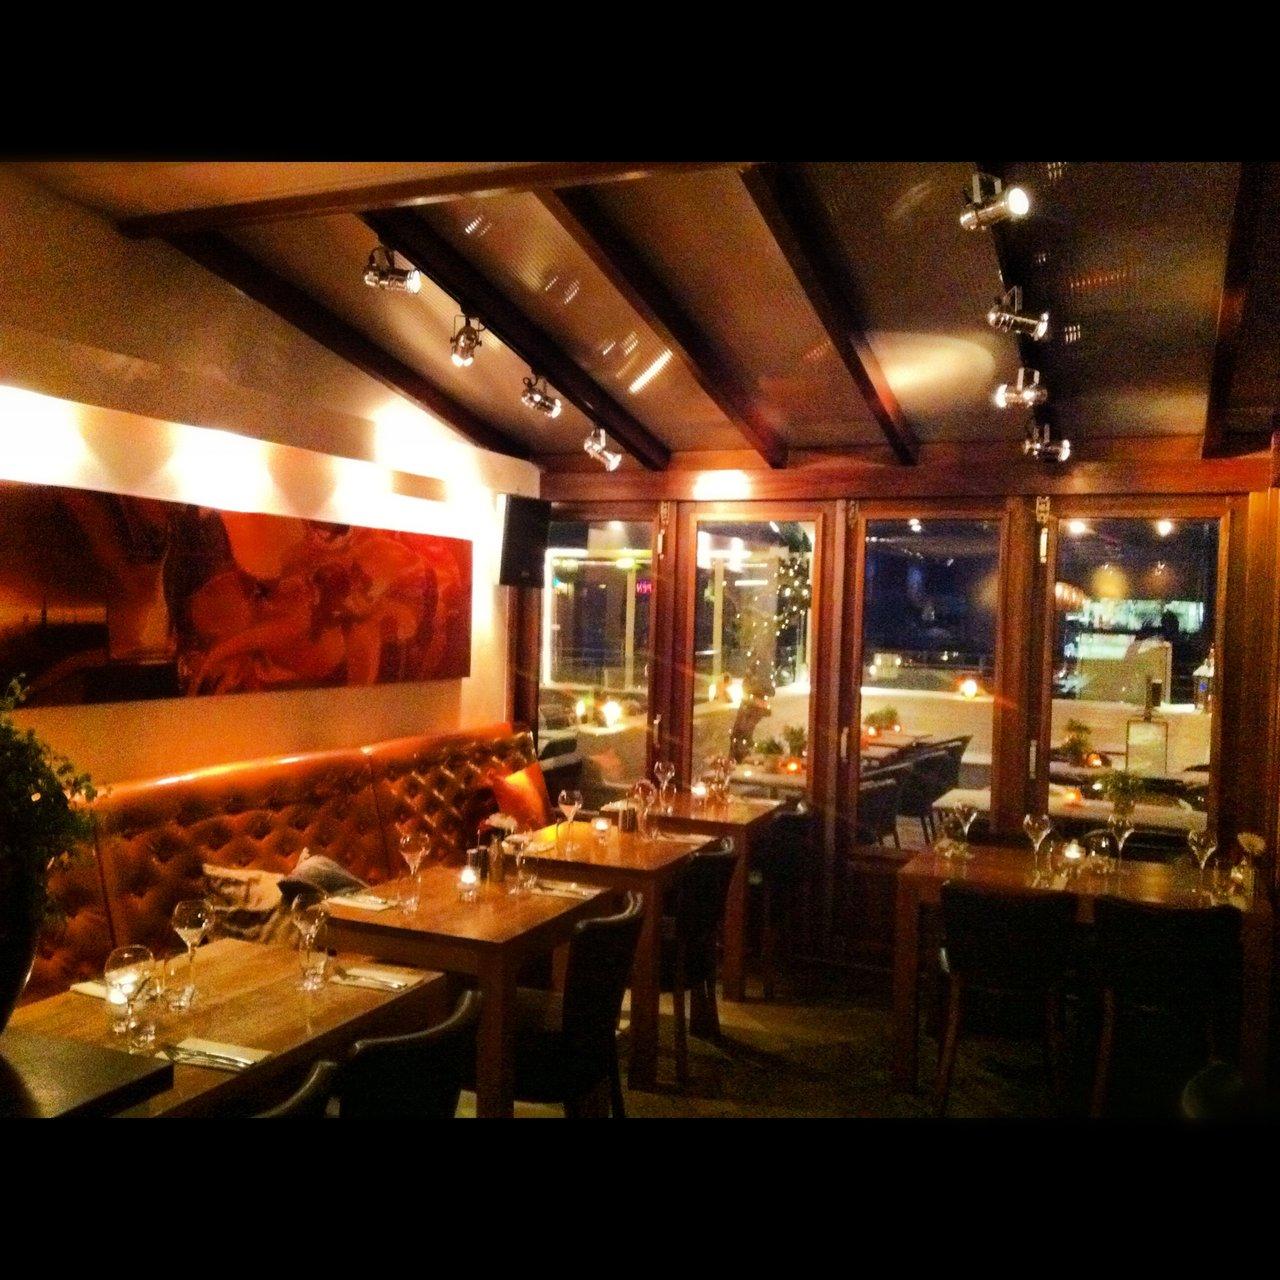 Restaurant wijnbar altro in den haag for Den haag restaurant